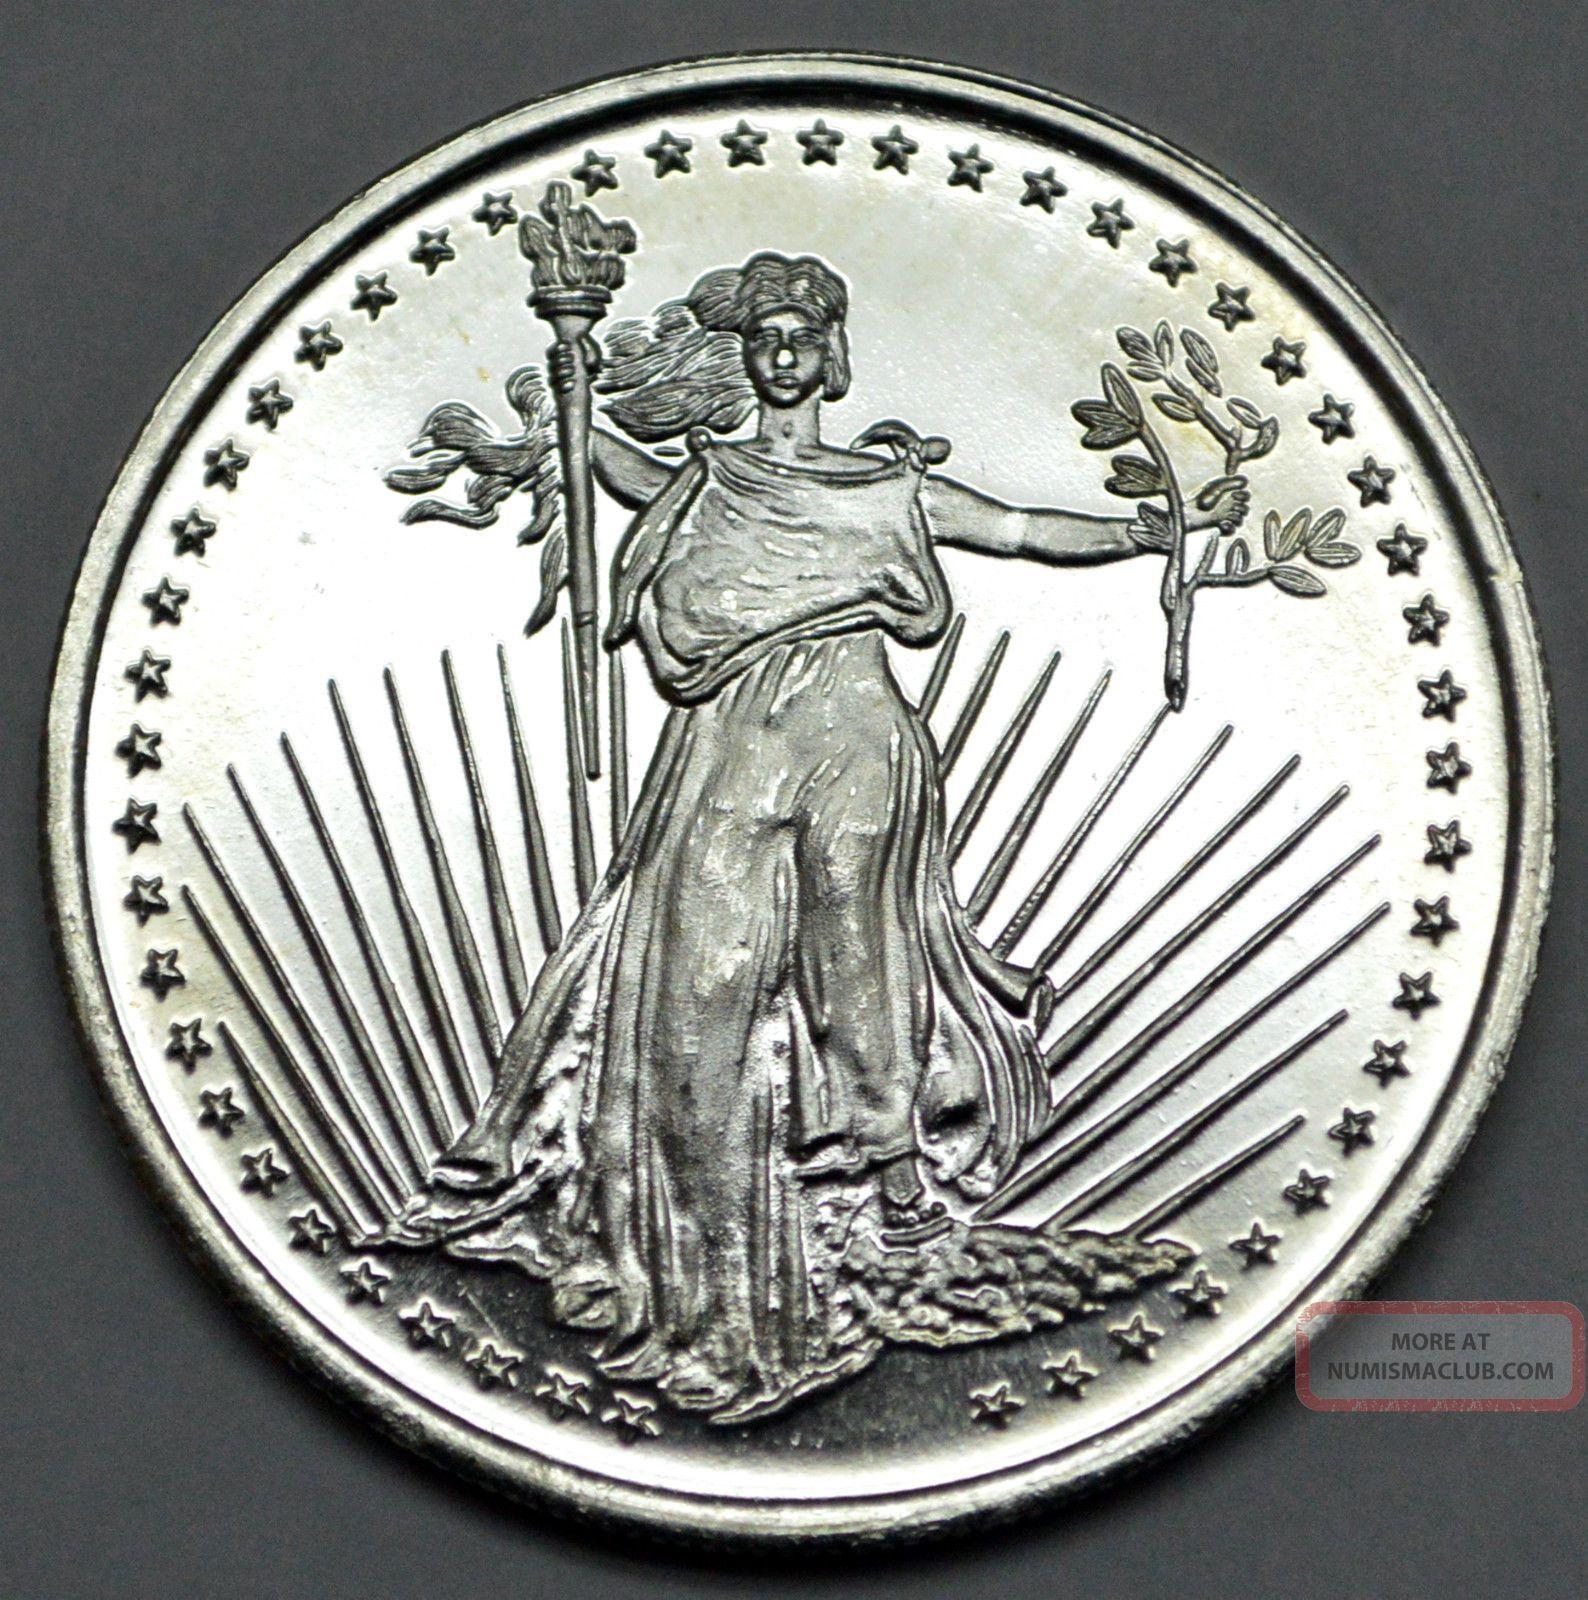 1 Troy Ounce Silver